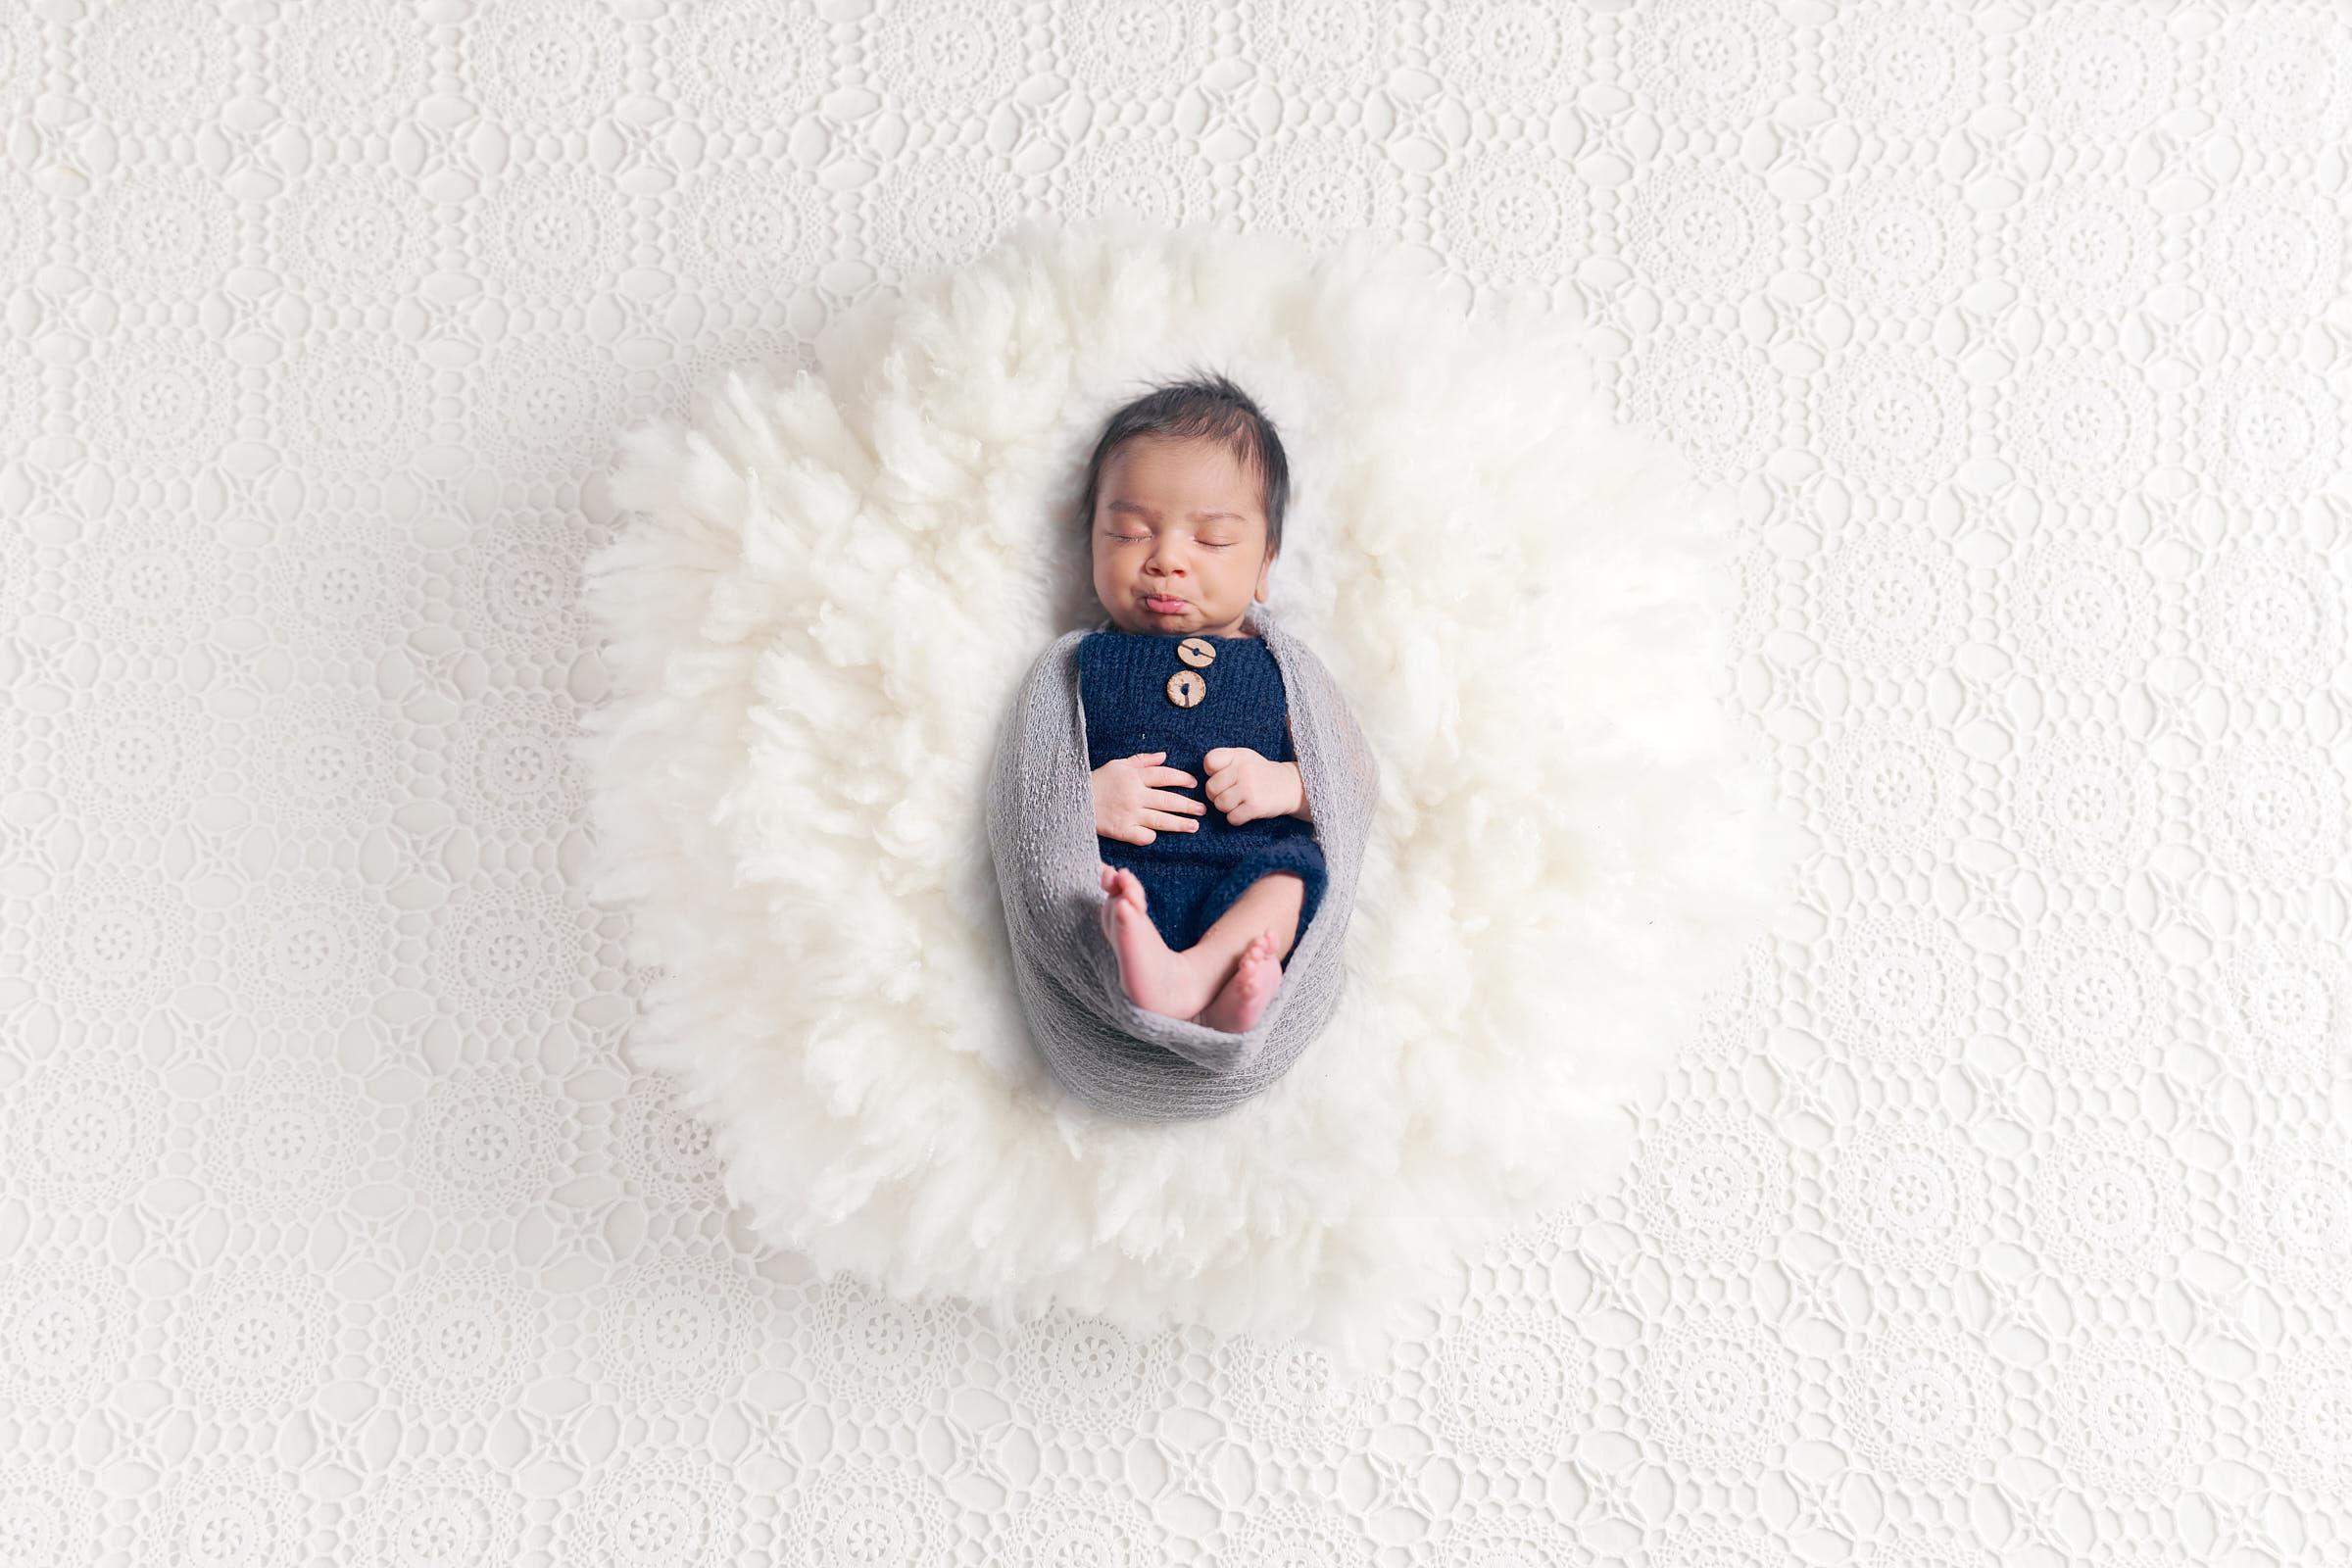 Cute Newborn Poses White Fur Backdrop Afewgoodclicks